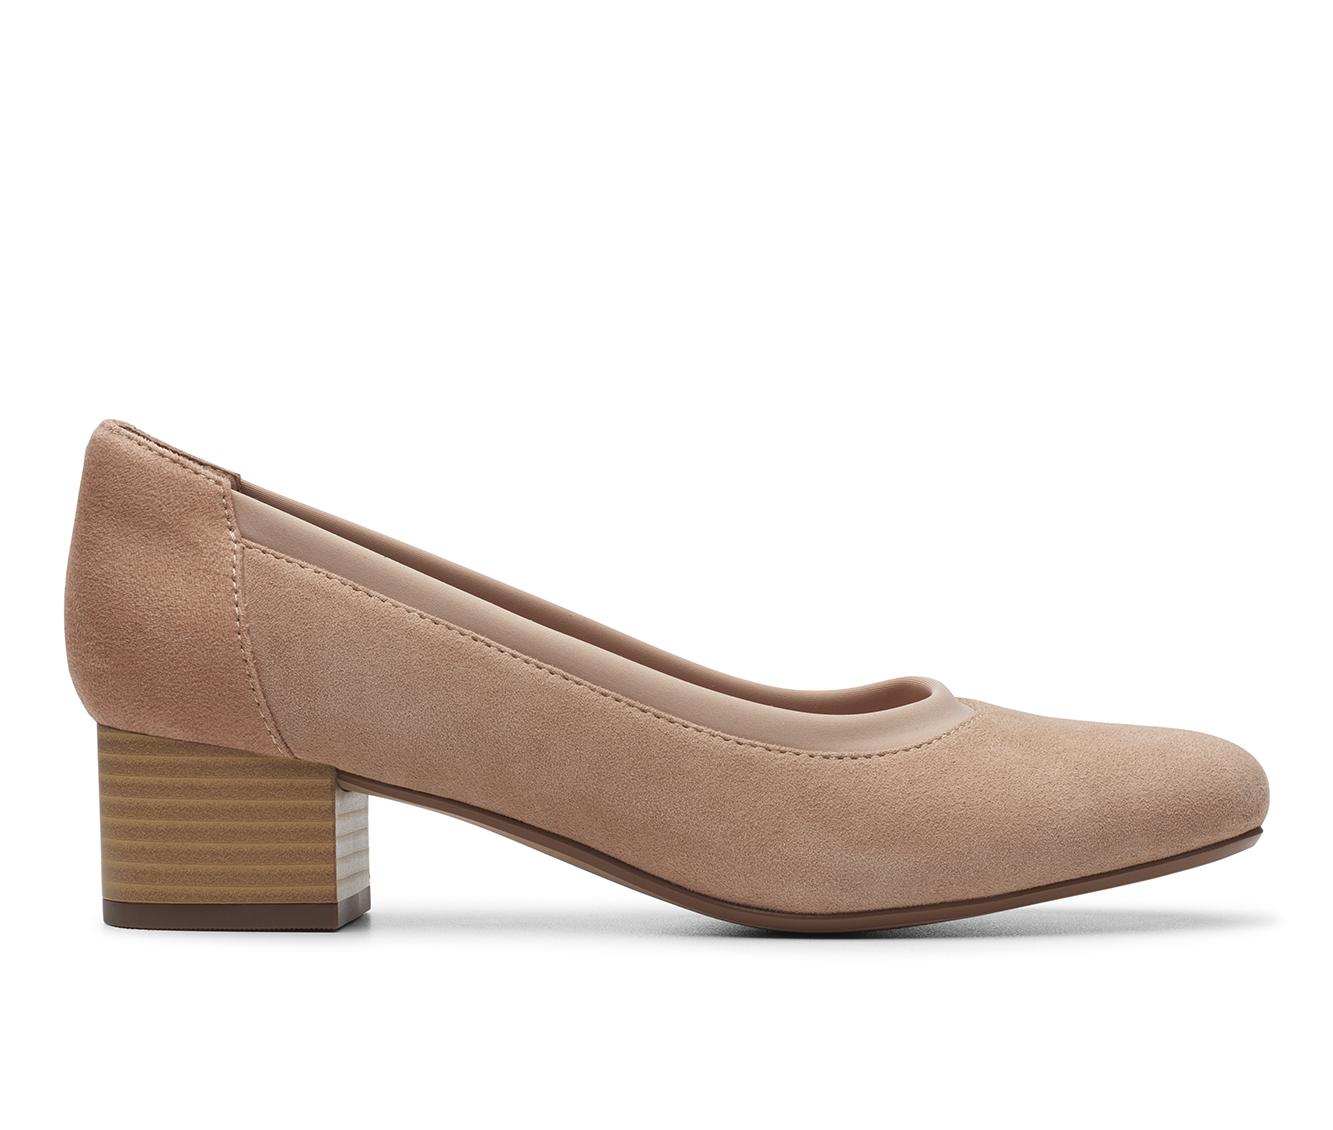 Clarks Chartli Fame Women's Dress Shoe (Brown Leather)